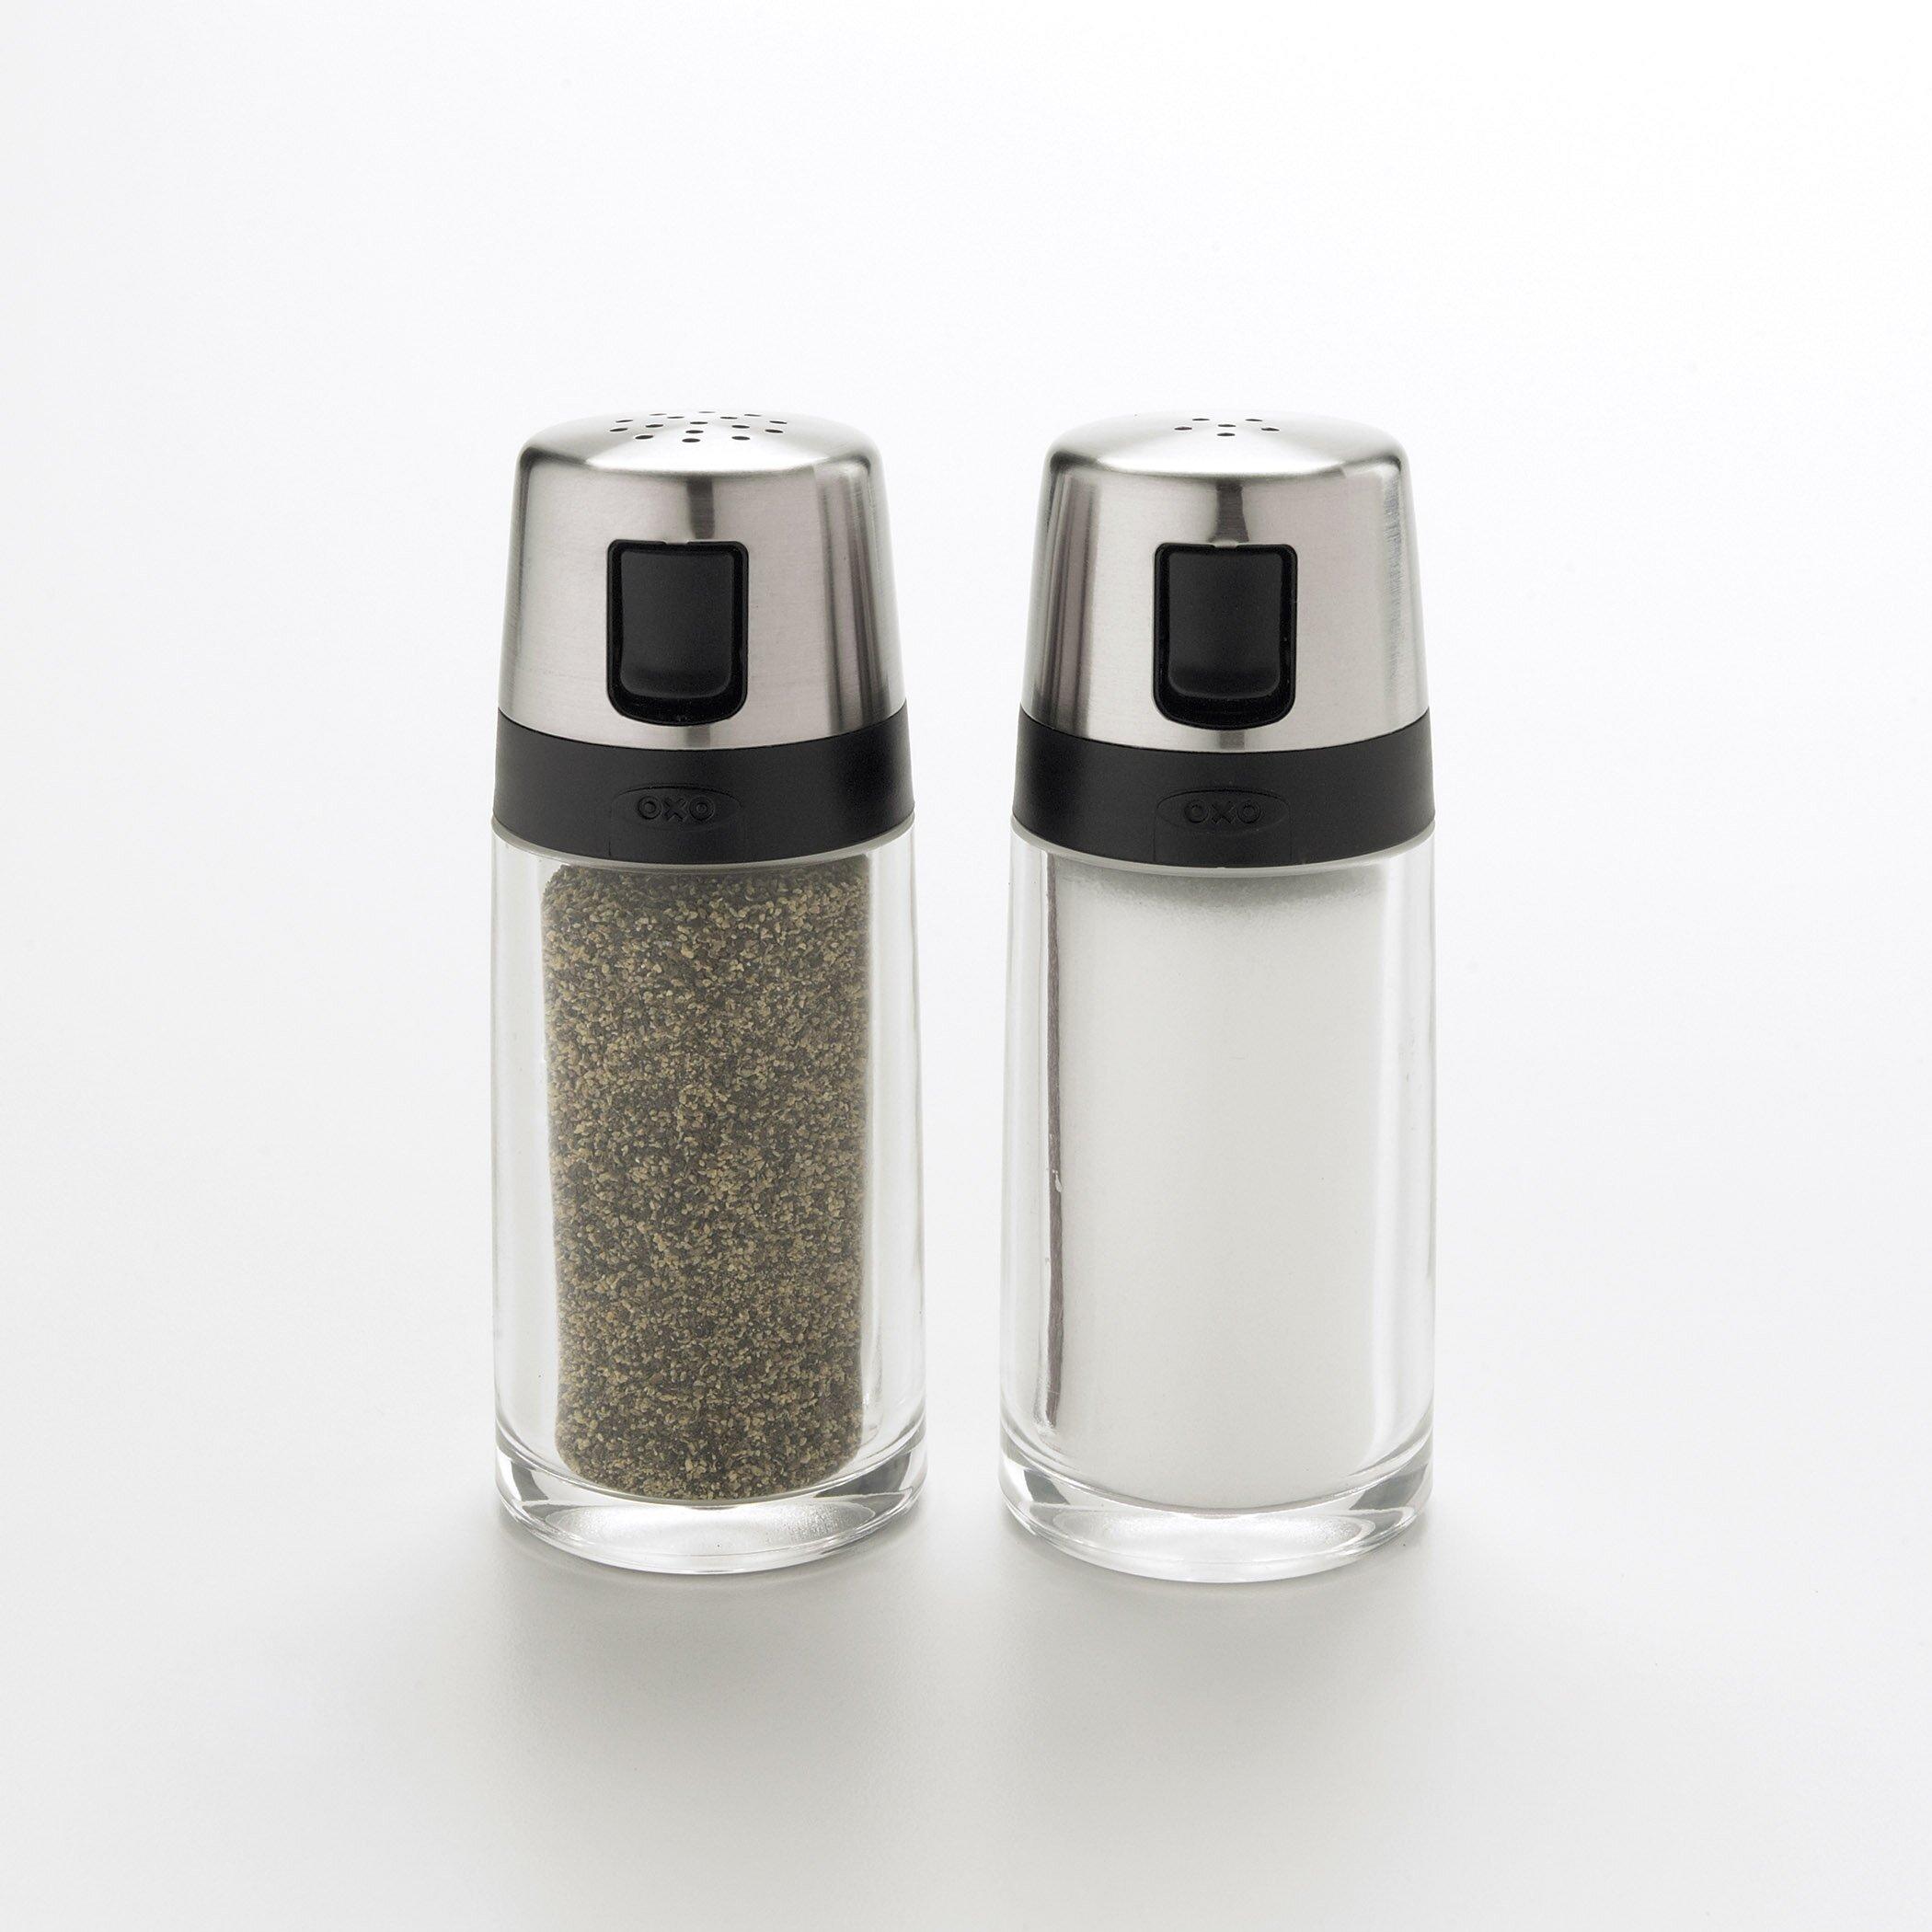 Christmas Salt And Pepper Shaker Sets